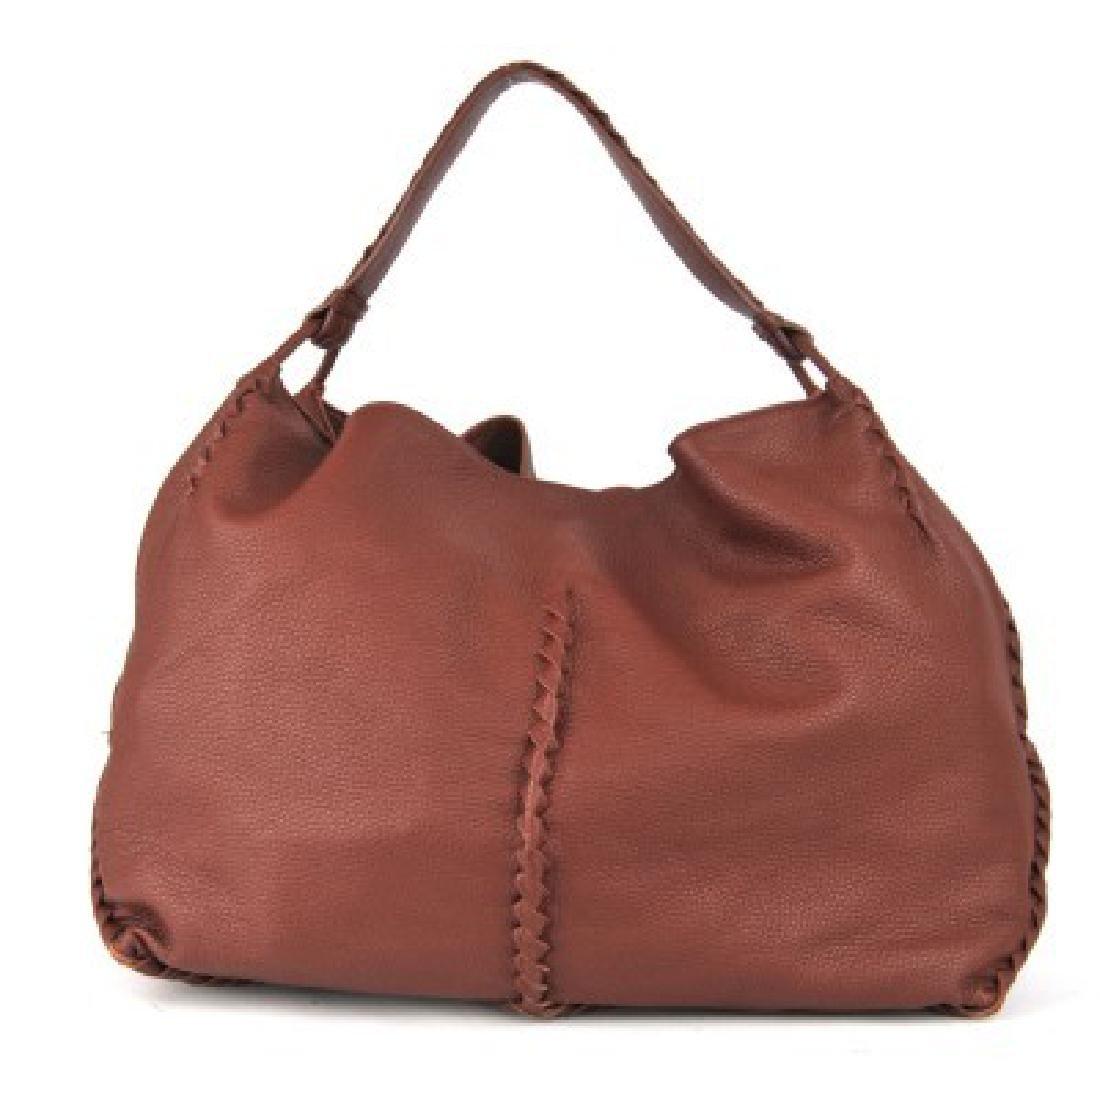 Bottega Veneta Cervo Shoulder Handbag